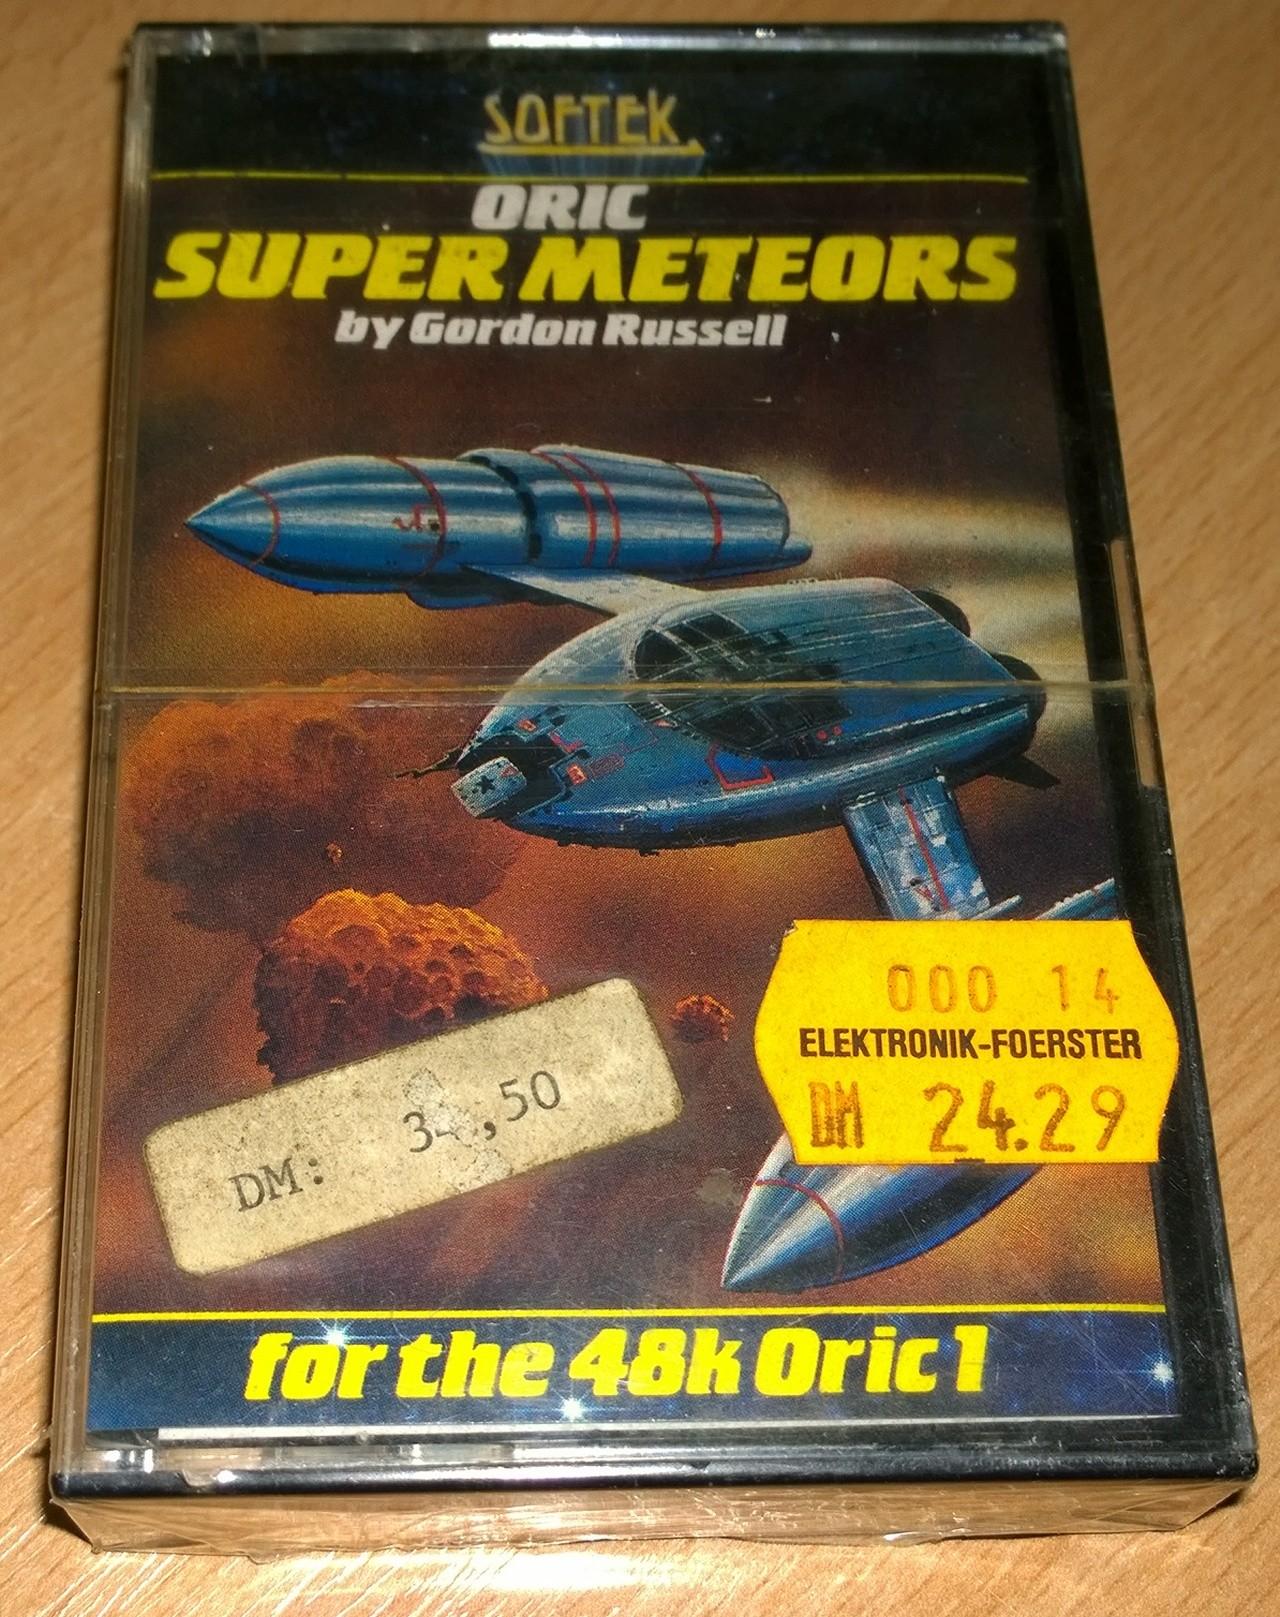 Super Meteors - Oric - Softek - NOS